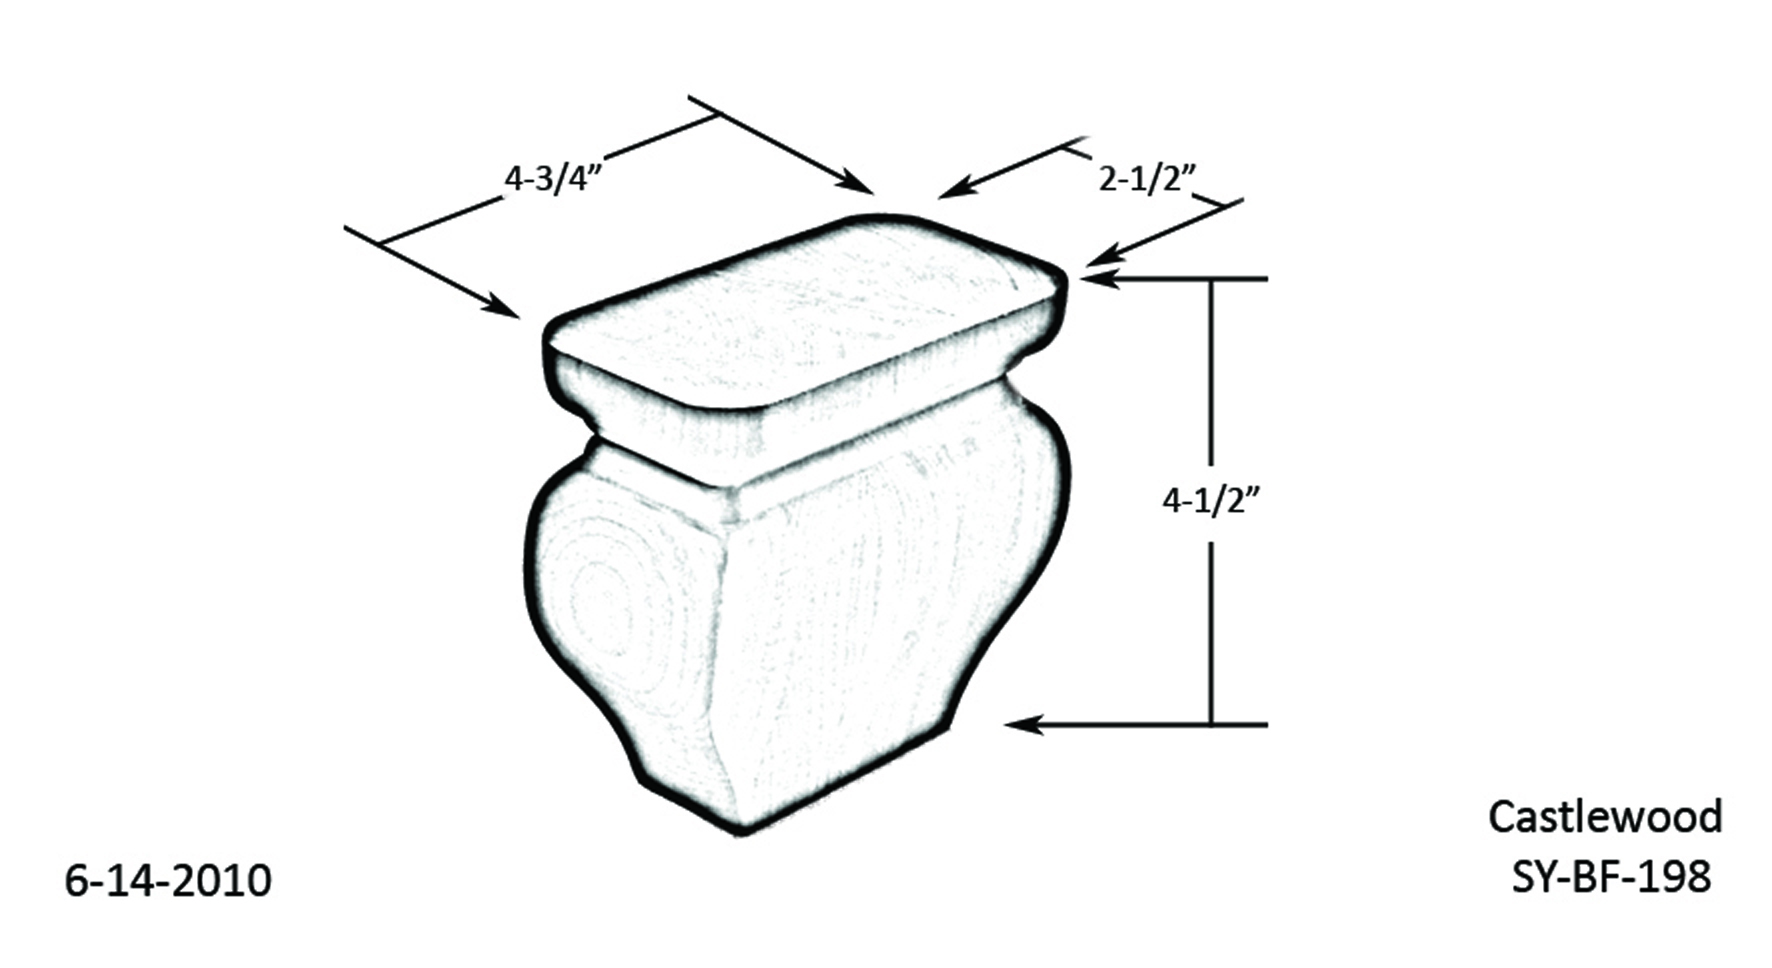 sy-bf-198-line-drawing.jpg